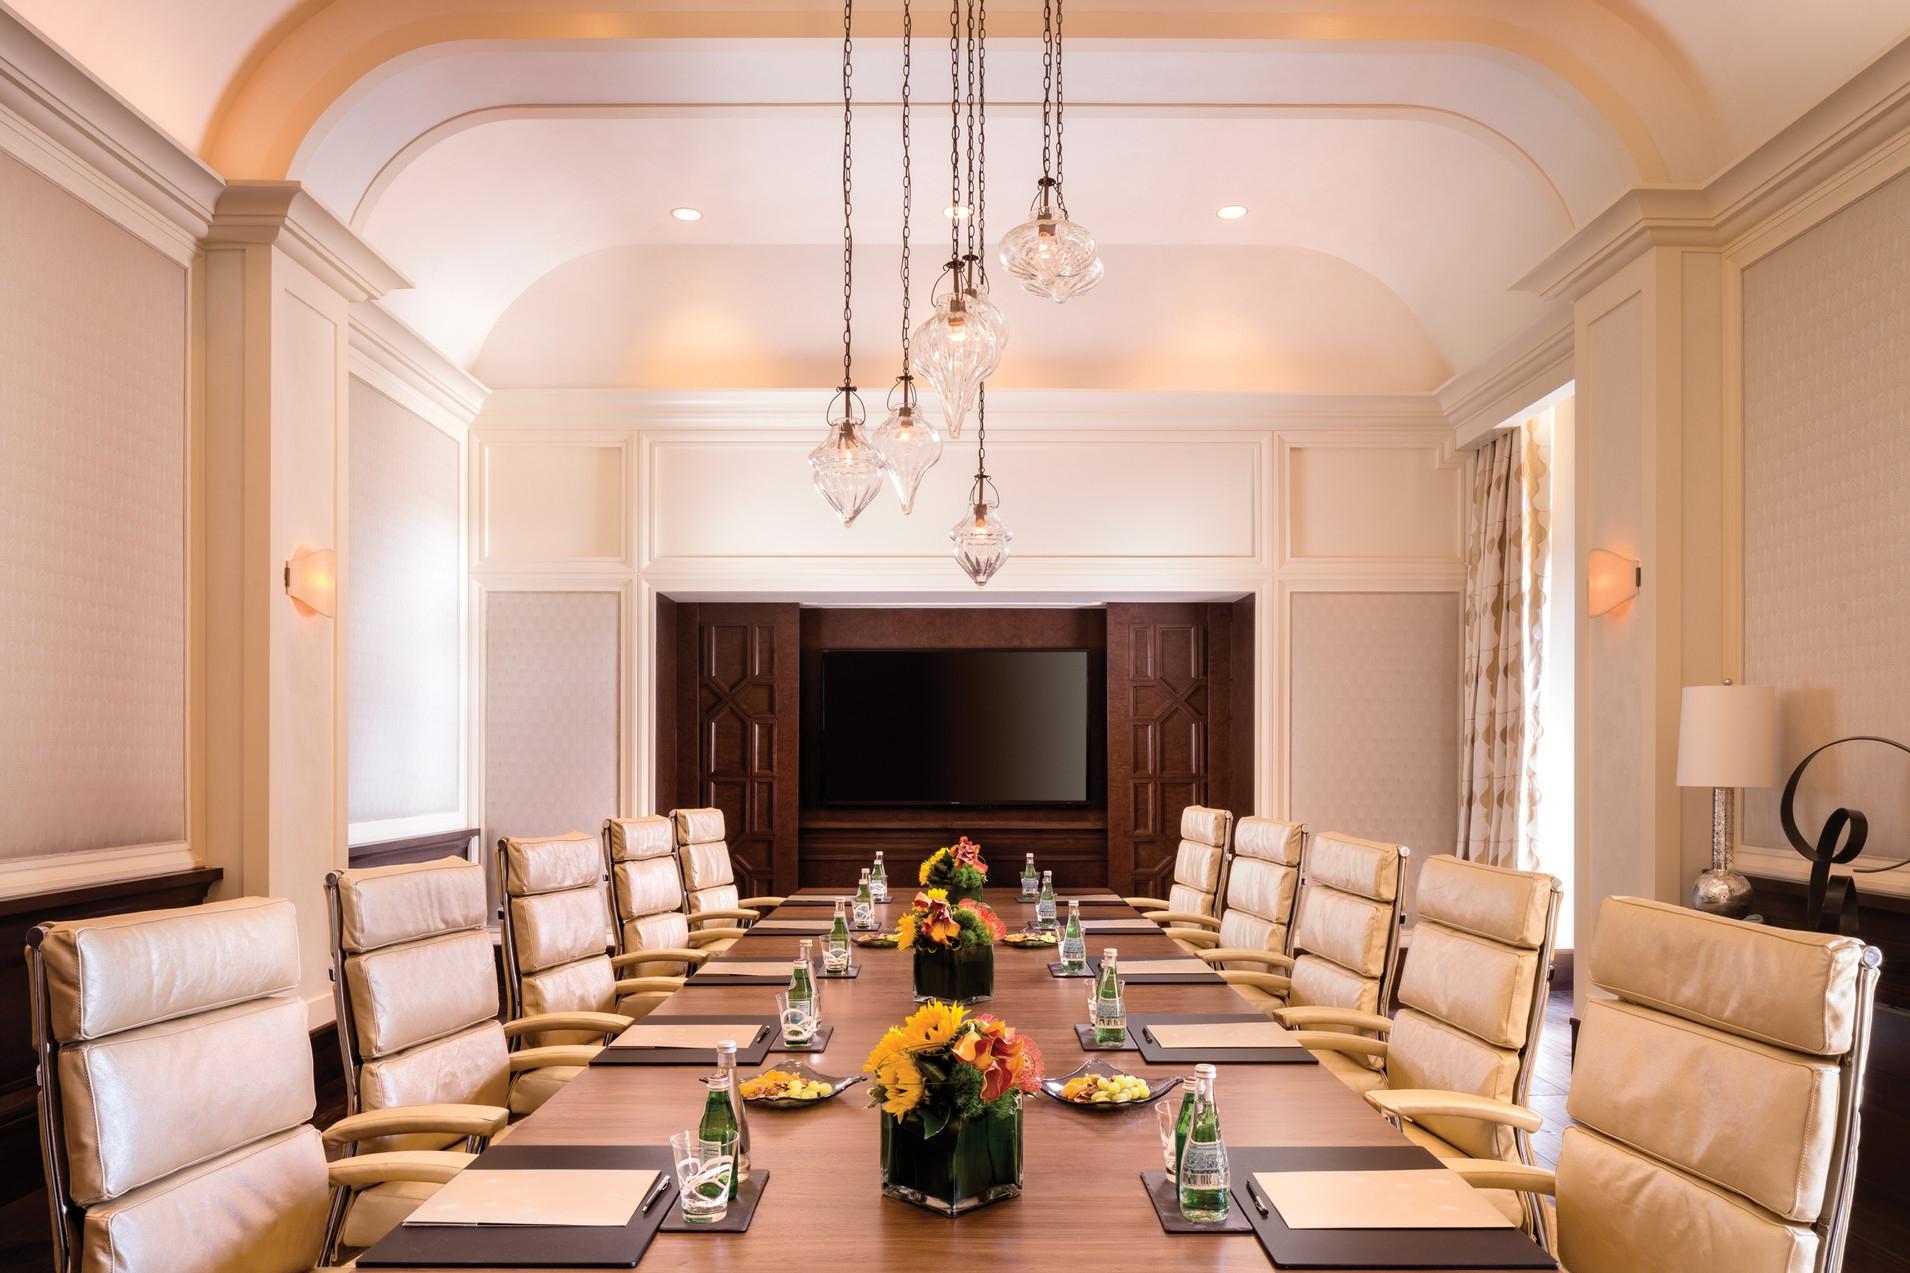 Four Seasons Orlando Board Room